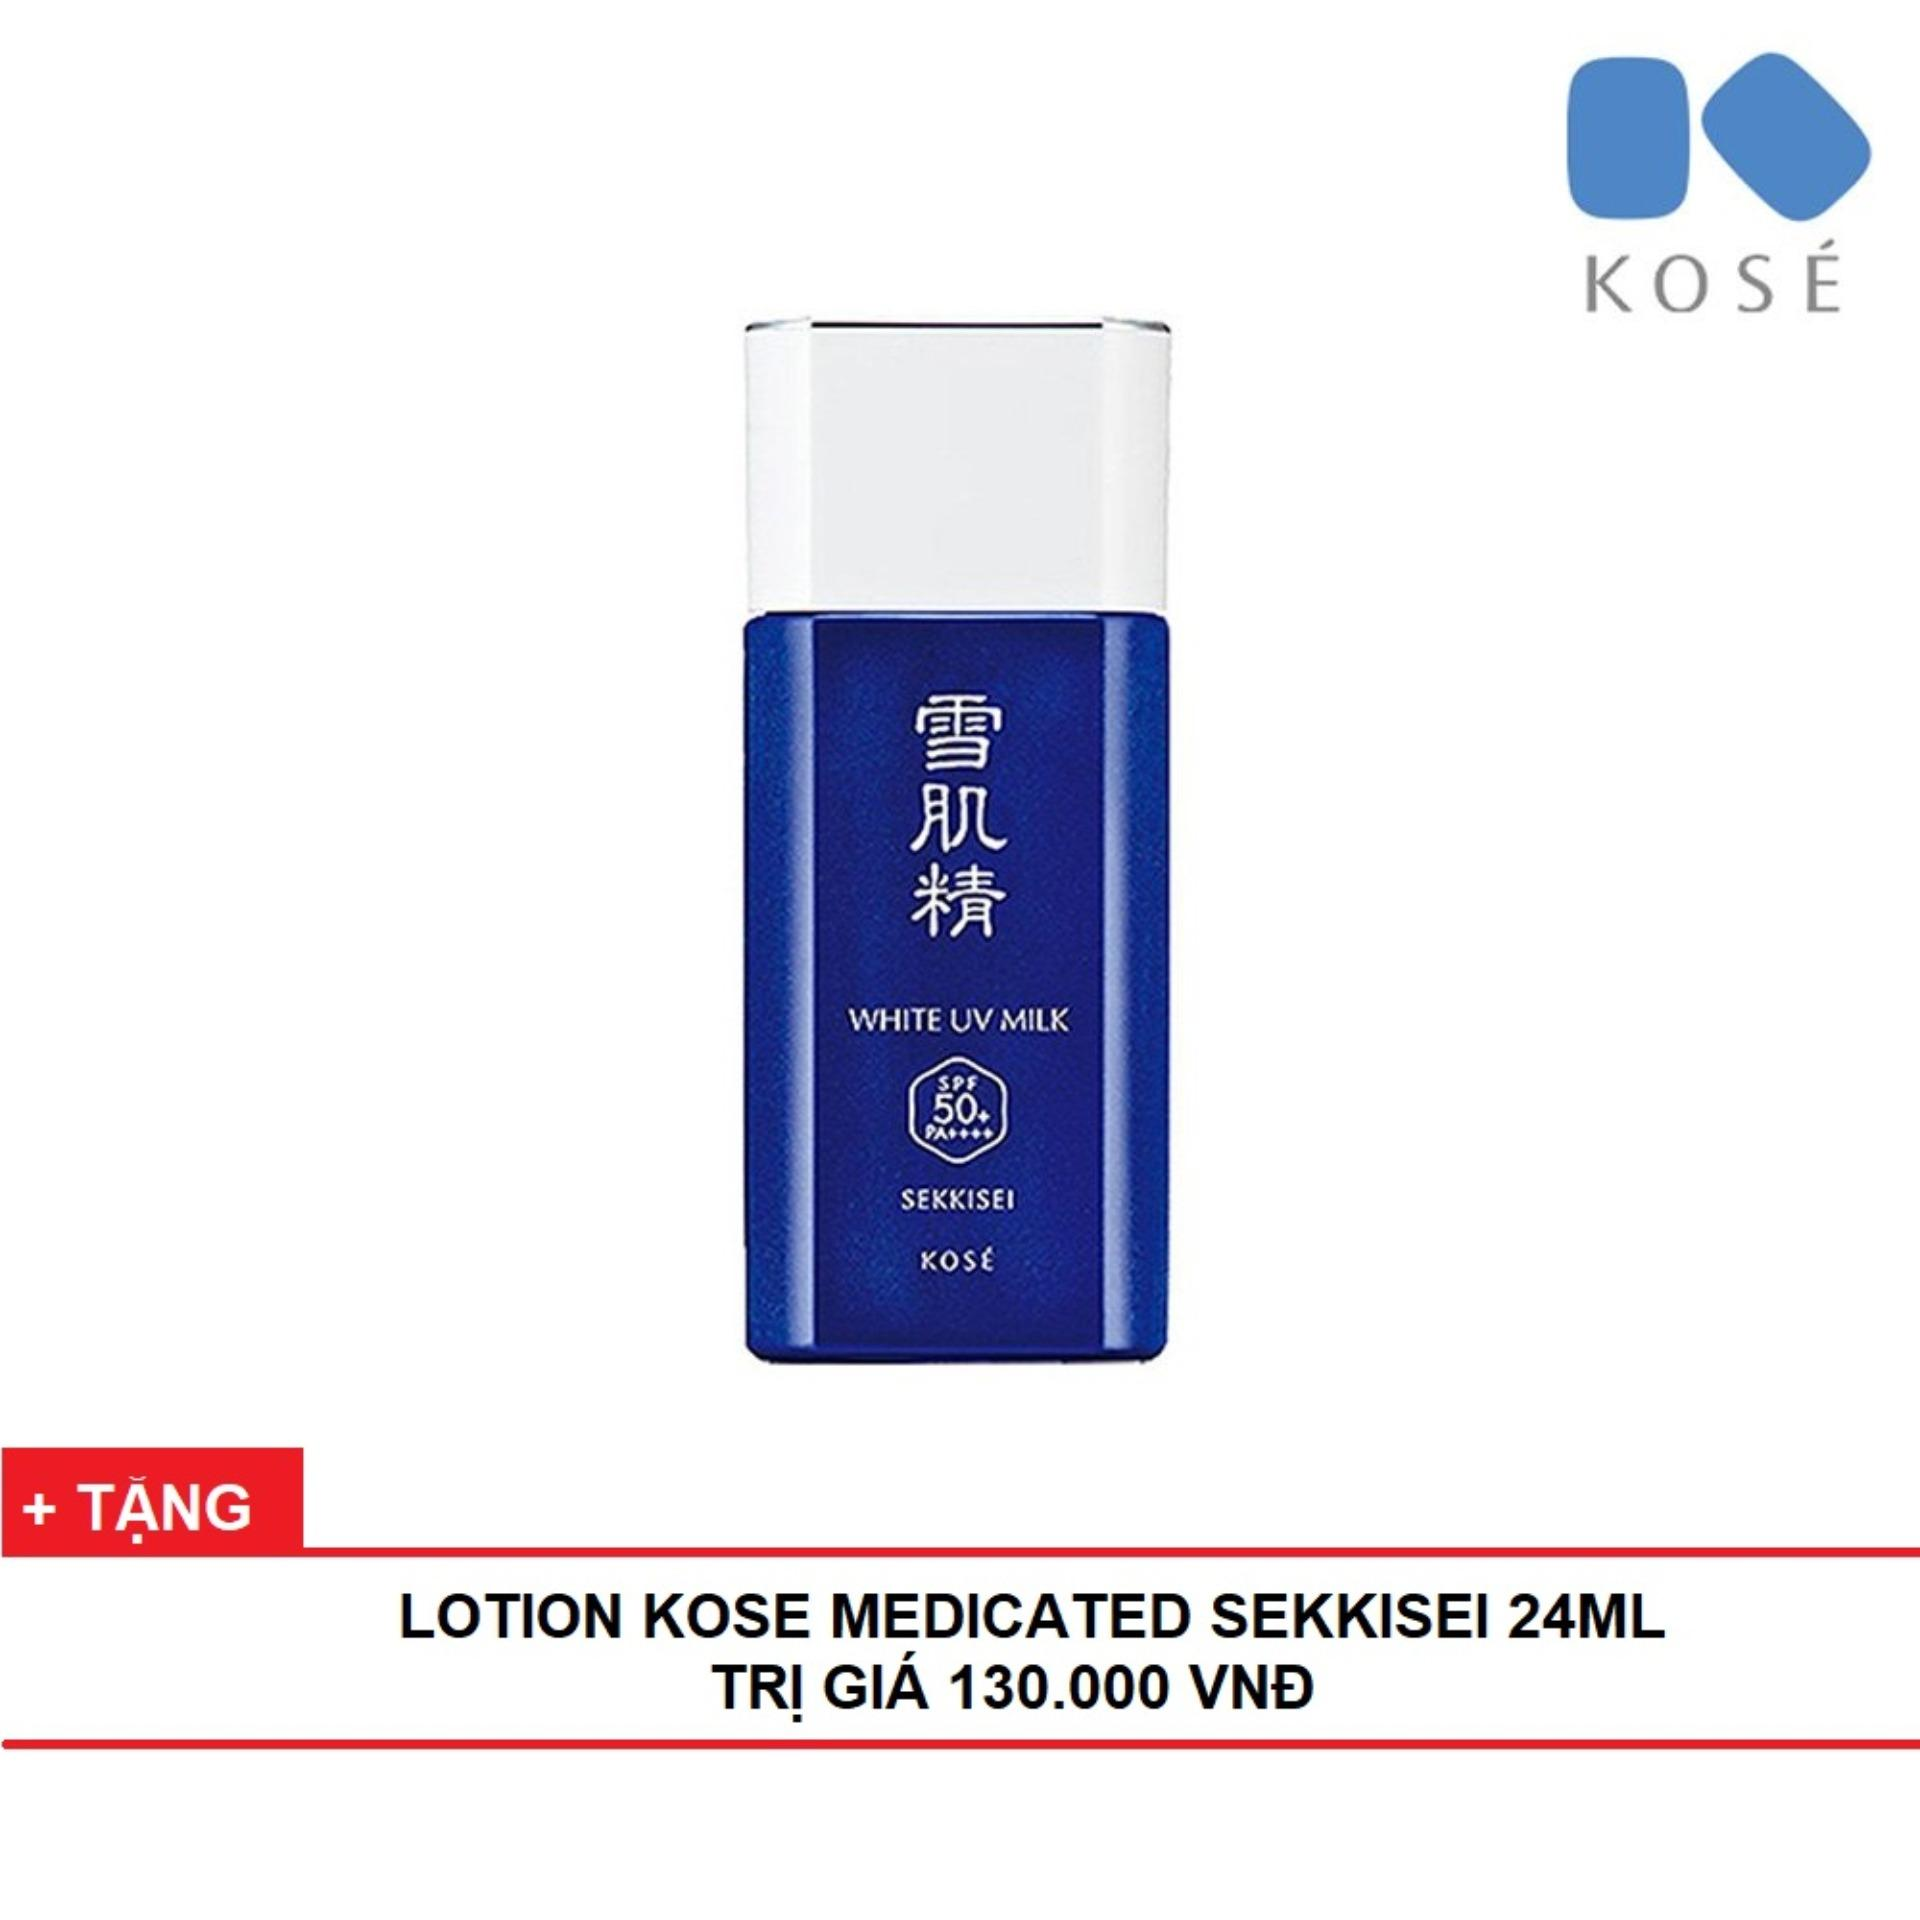 Kem Chống Nắng Kose Sekkisei White UV Milk - 60 gram - TITIAN (Mẫu Mới) nhập khẩu